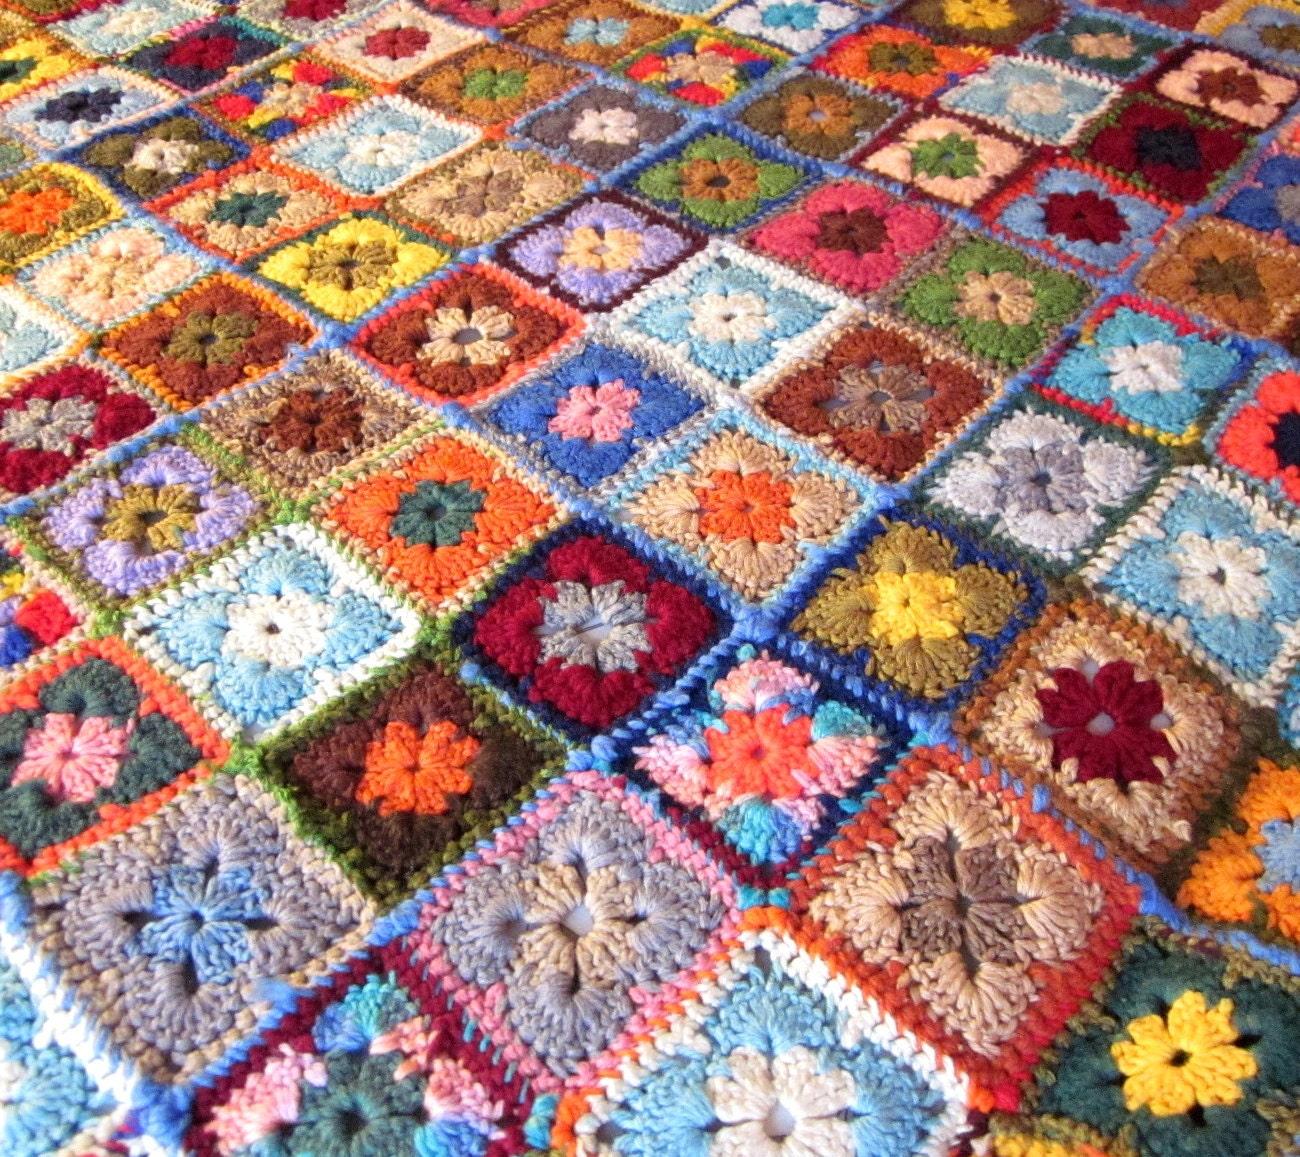 Vintage Afghan Blanket Granny Square Crochet Throw